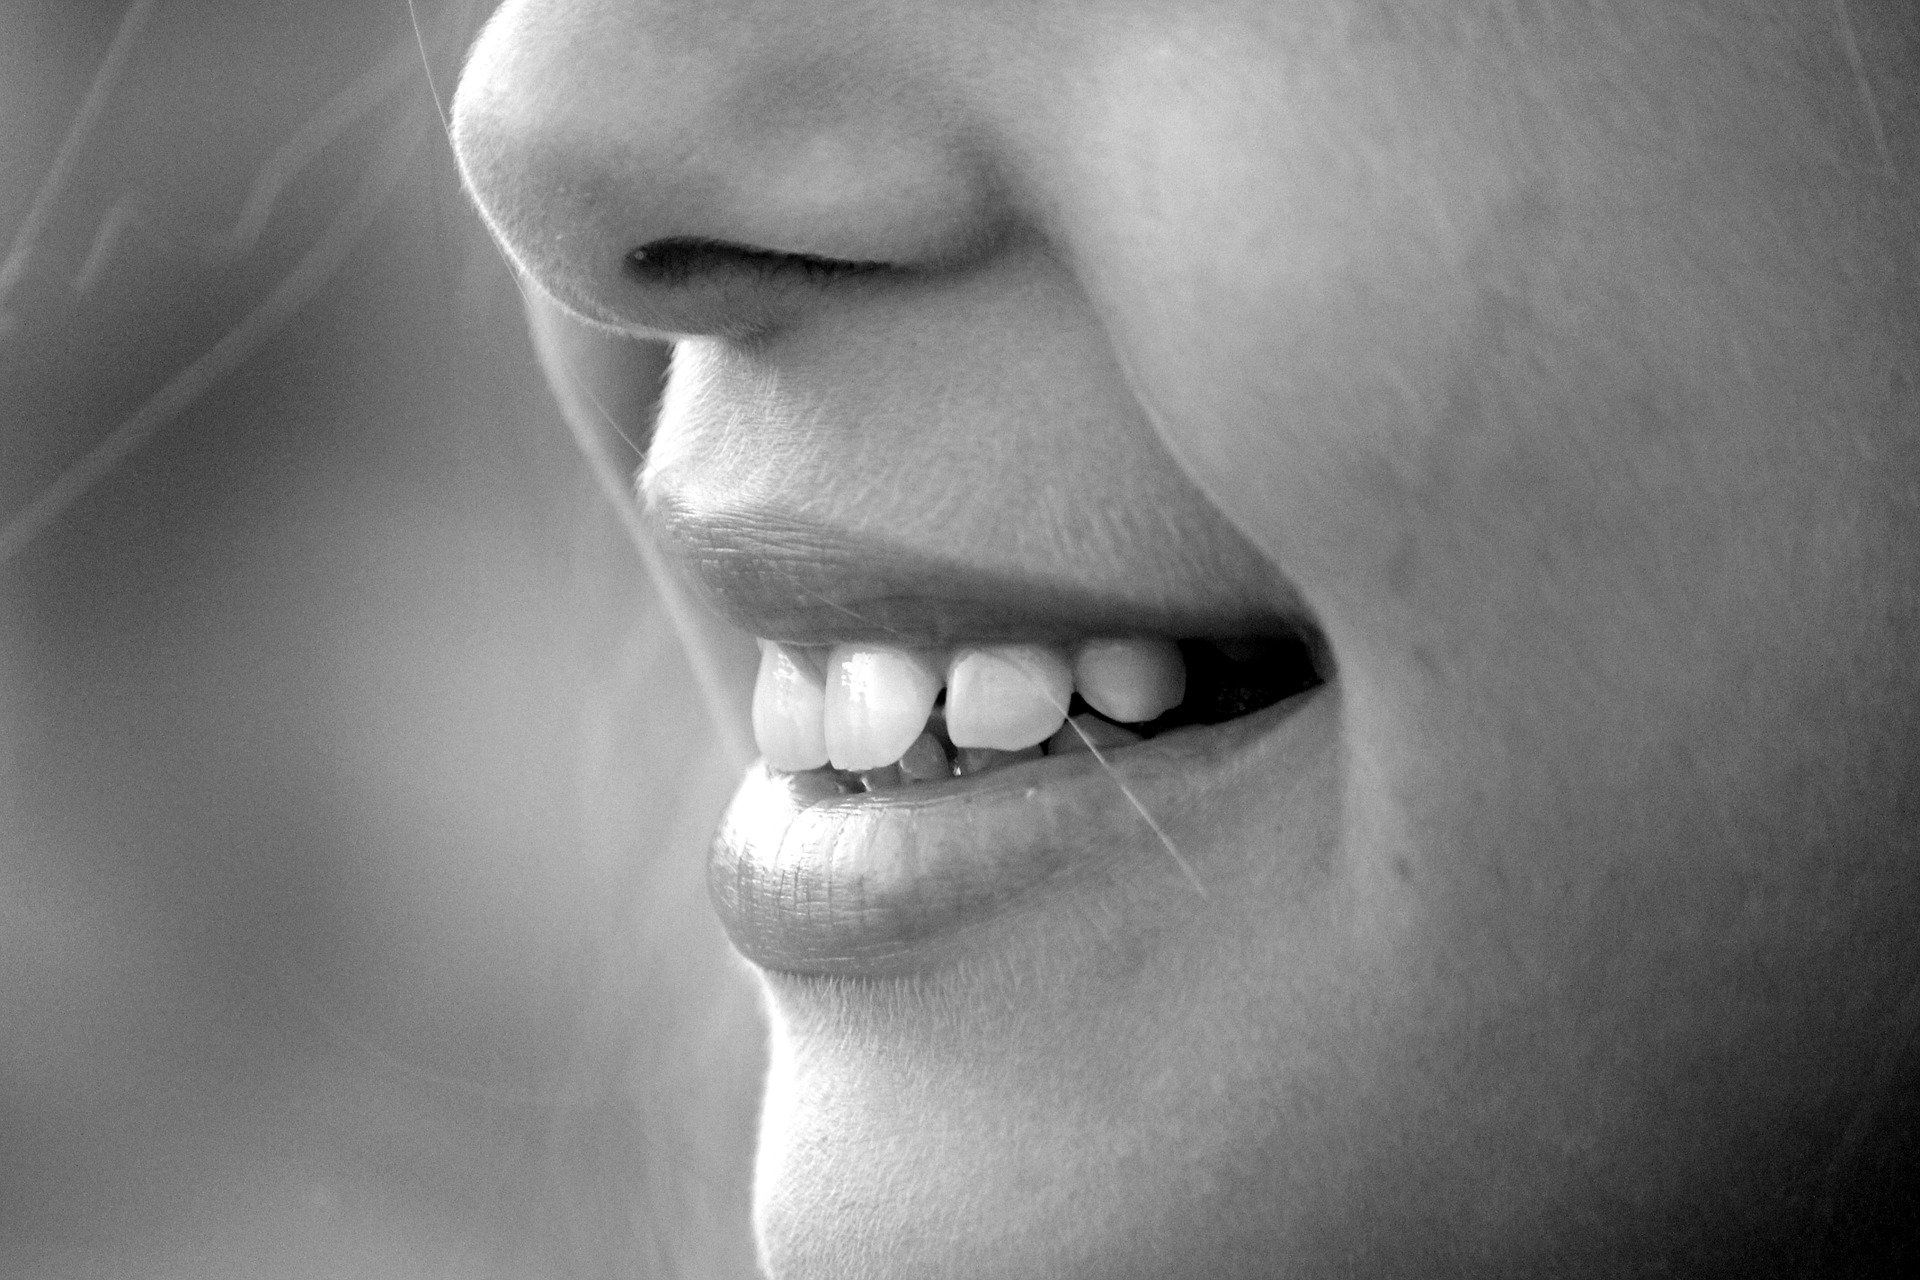 Skutki stomatologiczne niedoboru witaminy D